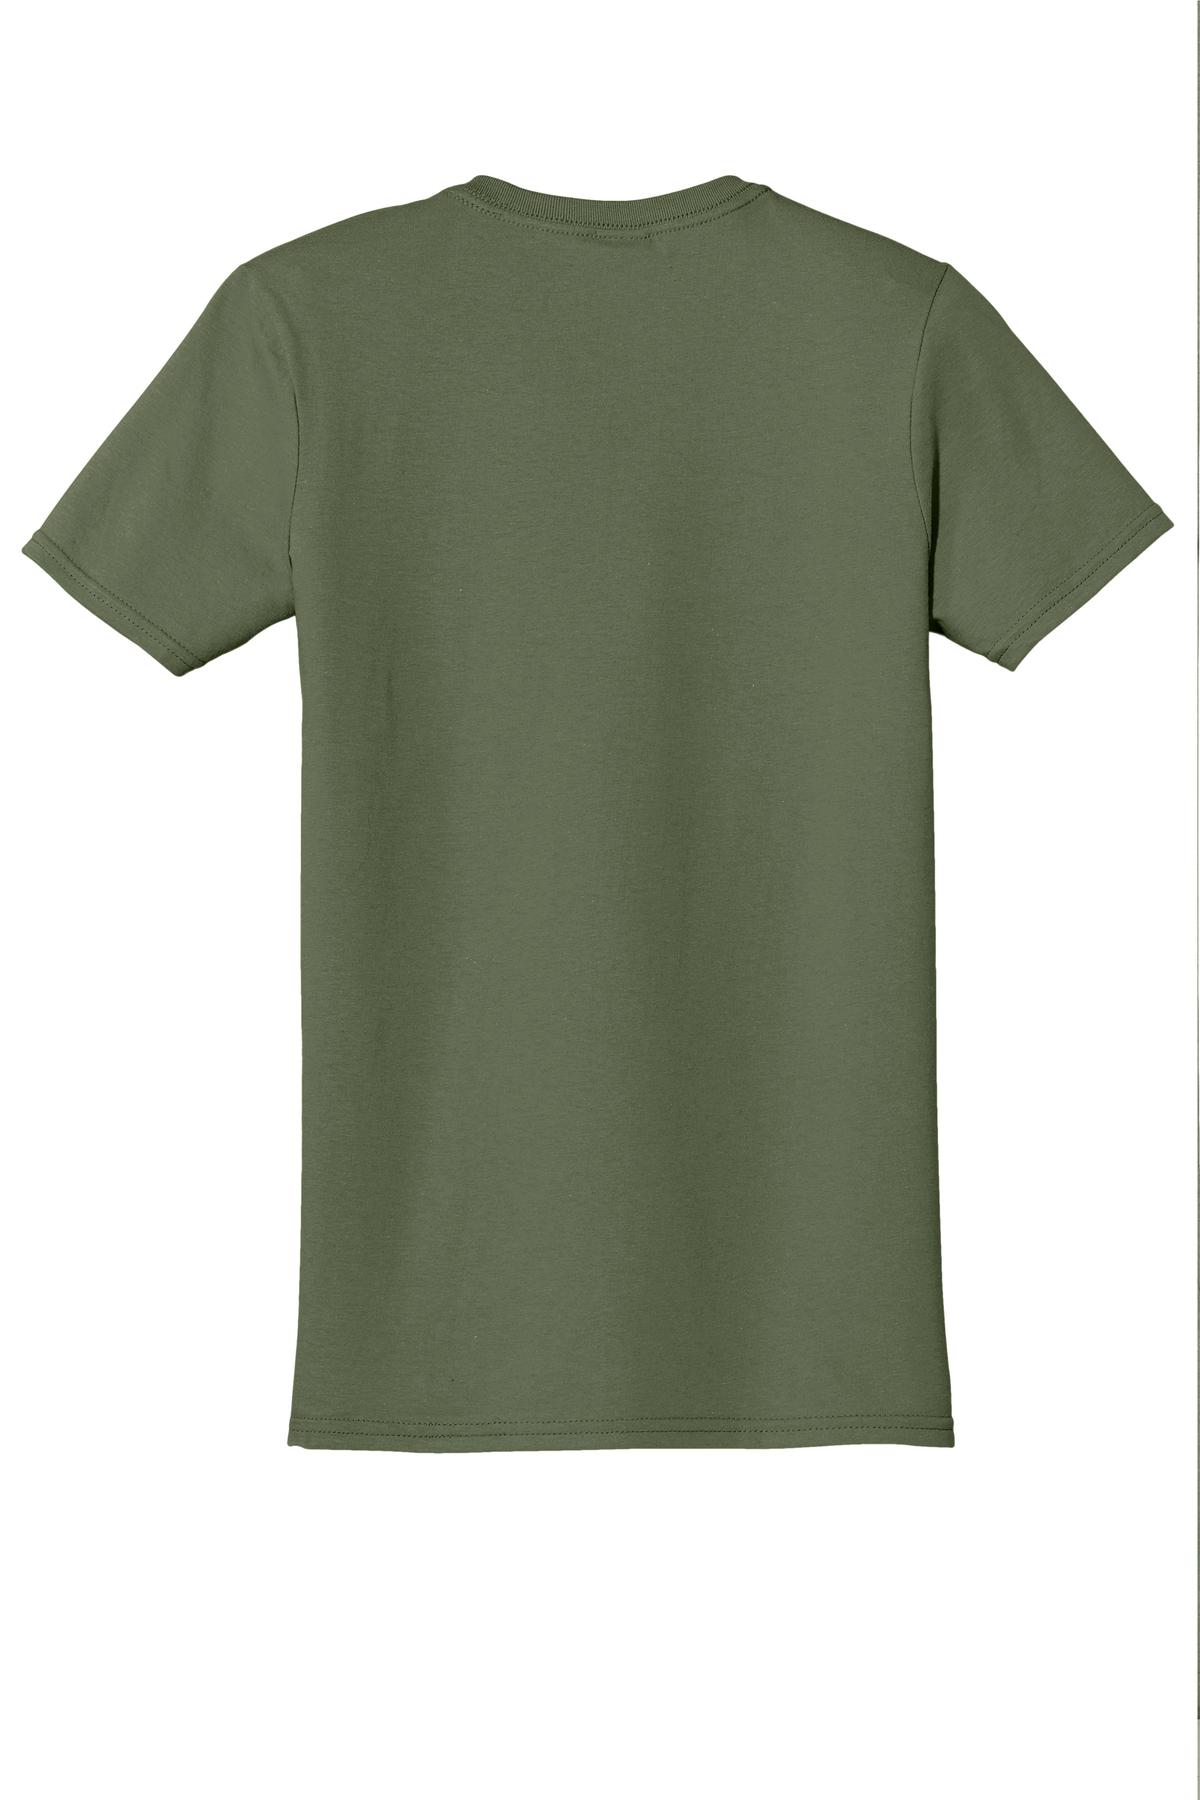 50 50 Outlet >> Gildan Softstyle® T-Shirt | 100% Cotton | T-Shirts | SanMar